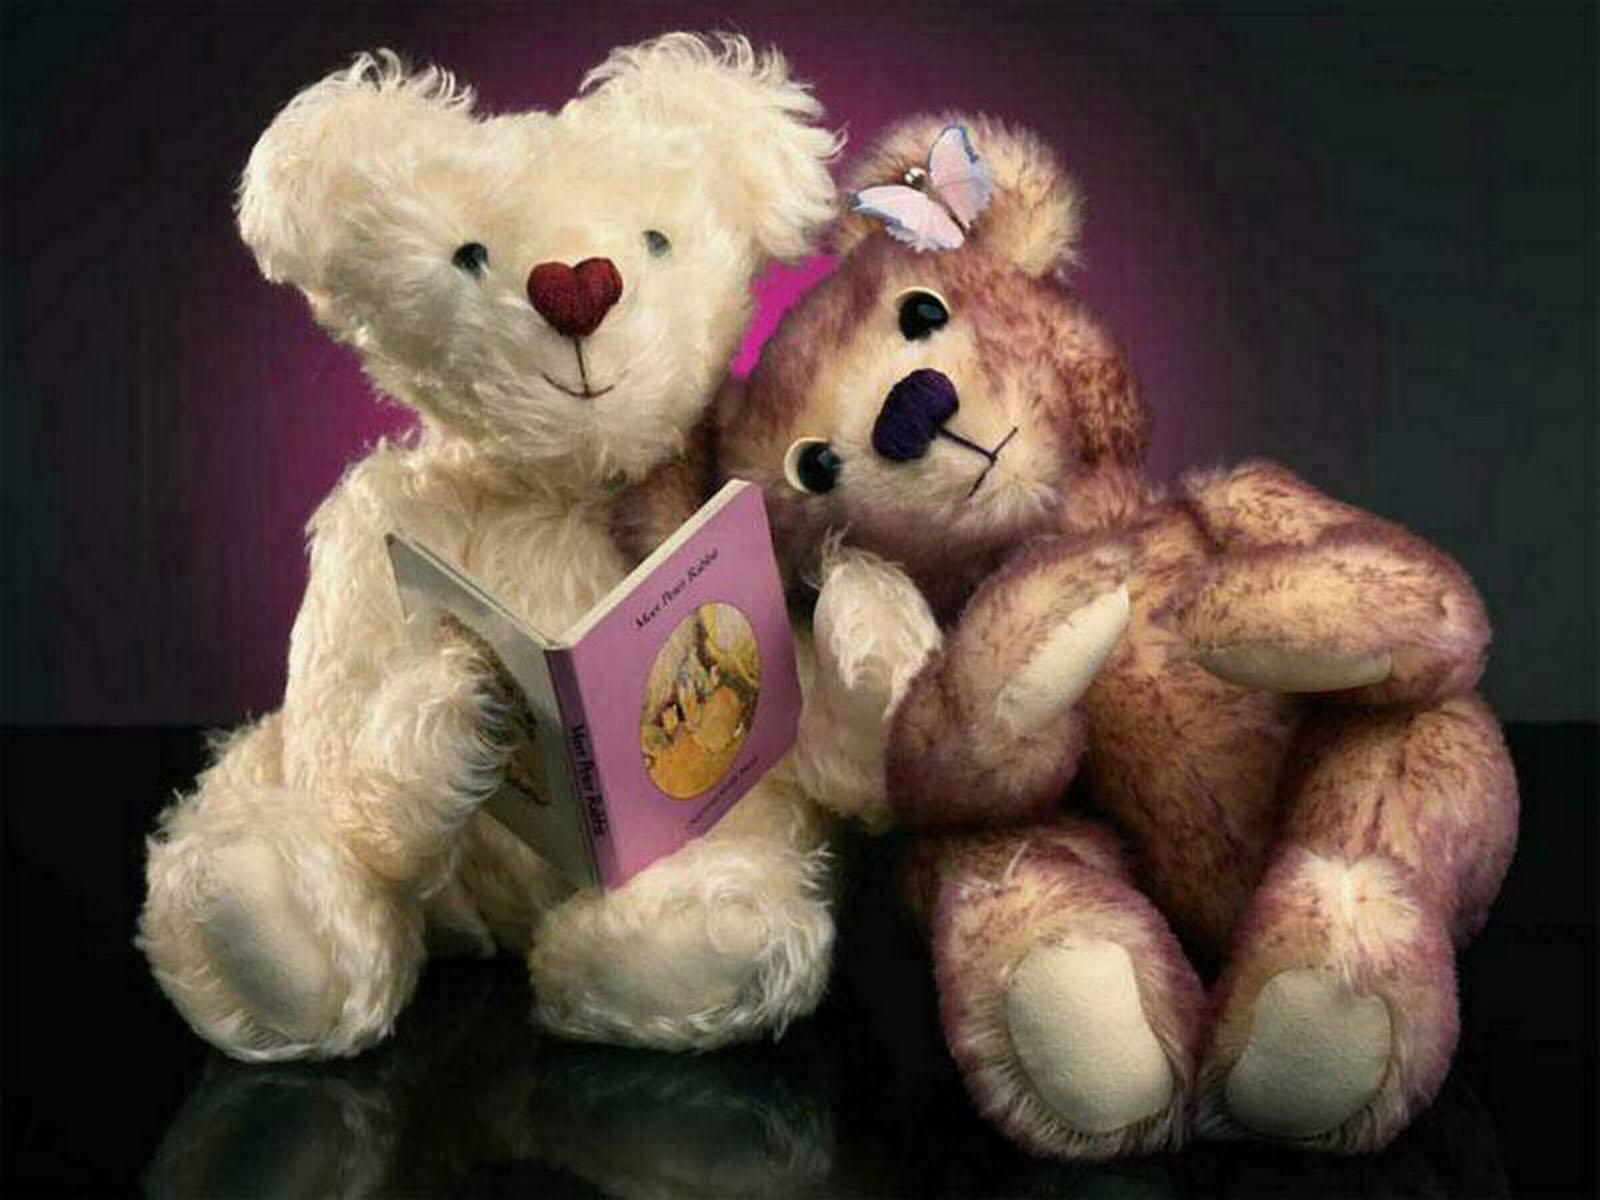 47 free bear wallpapers for desktop on wallpapersafari - Free teddy bear pics ...